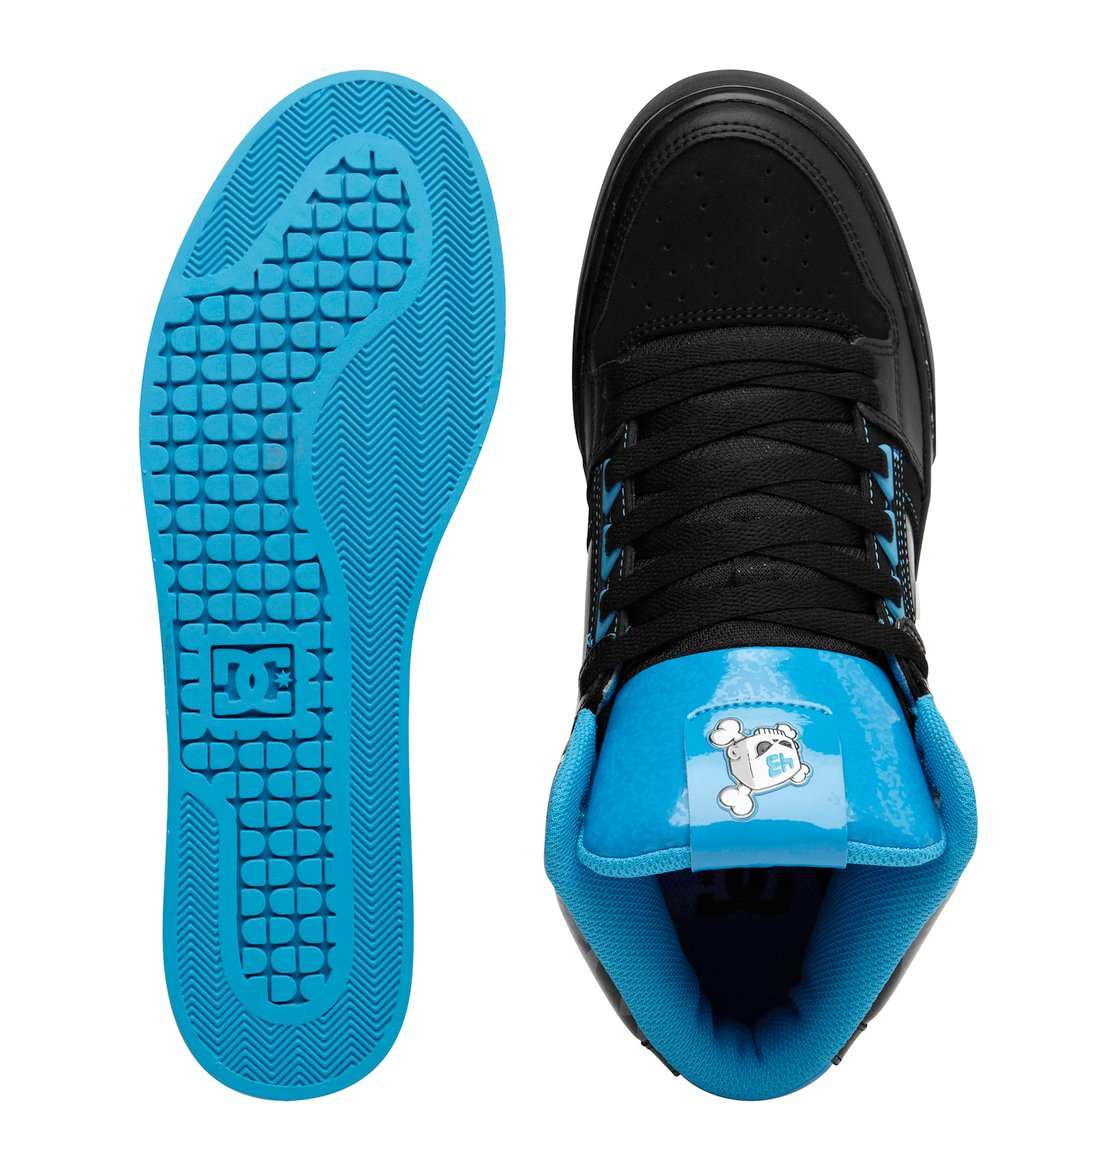 cheaper 41702 e7915 Men's Ken Block Spartan High WC Shoes ADYS400016 | DC Shoes